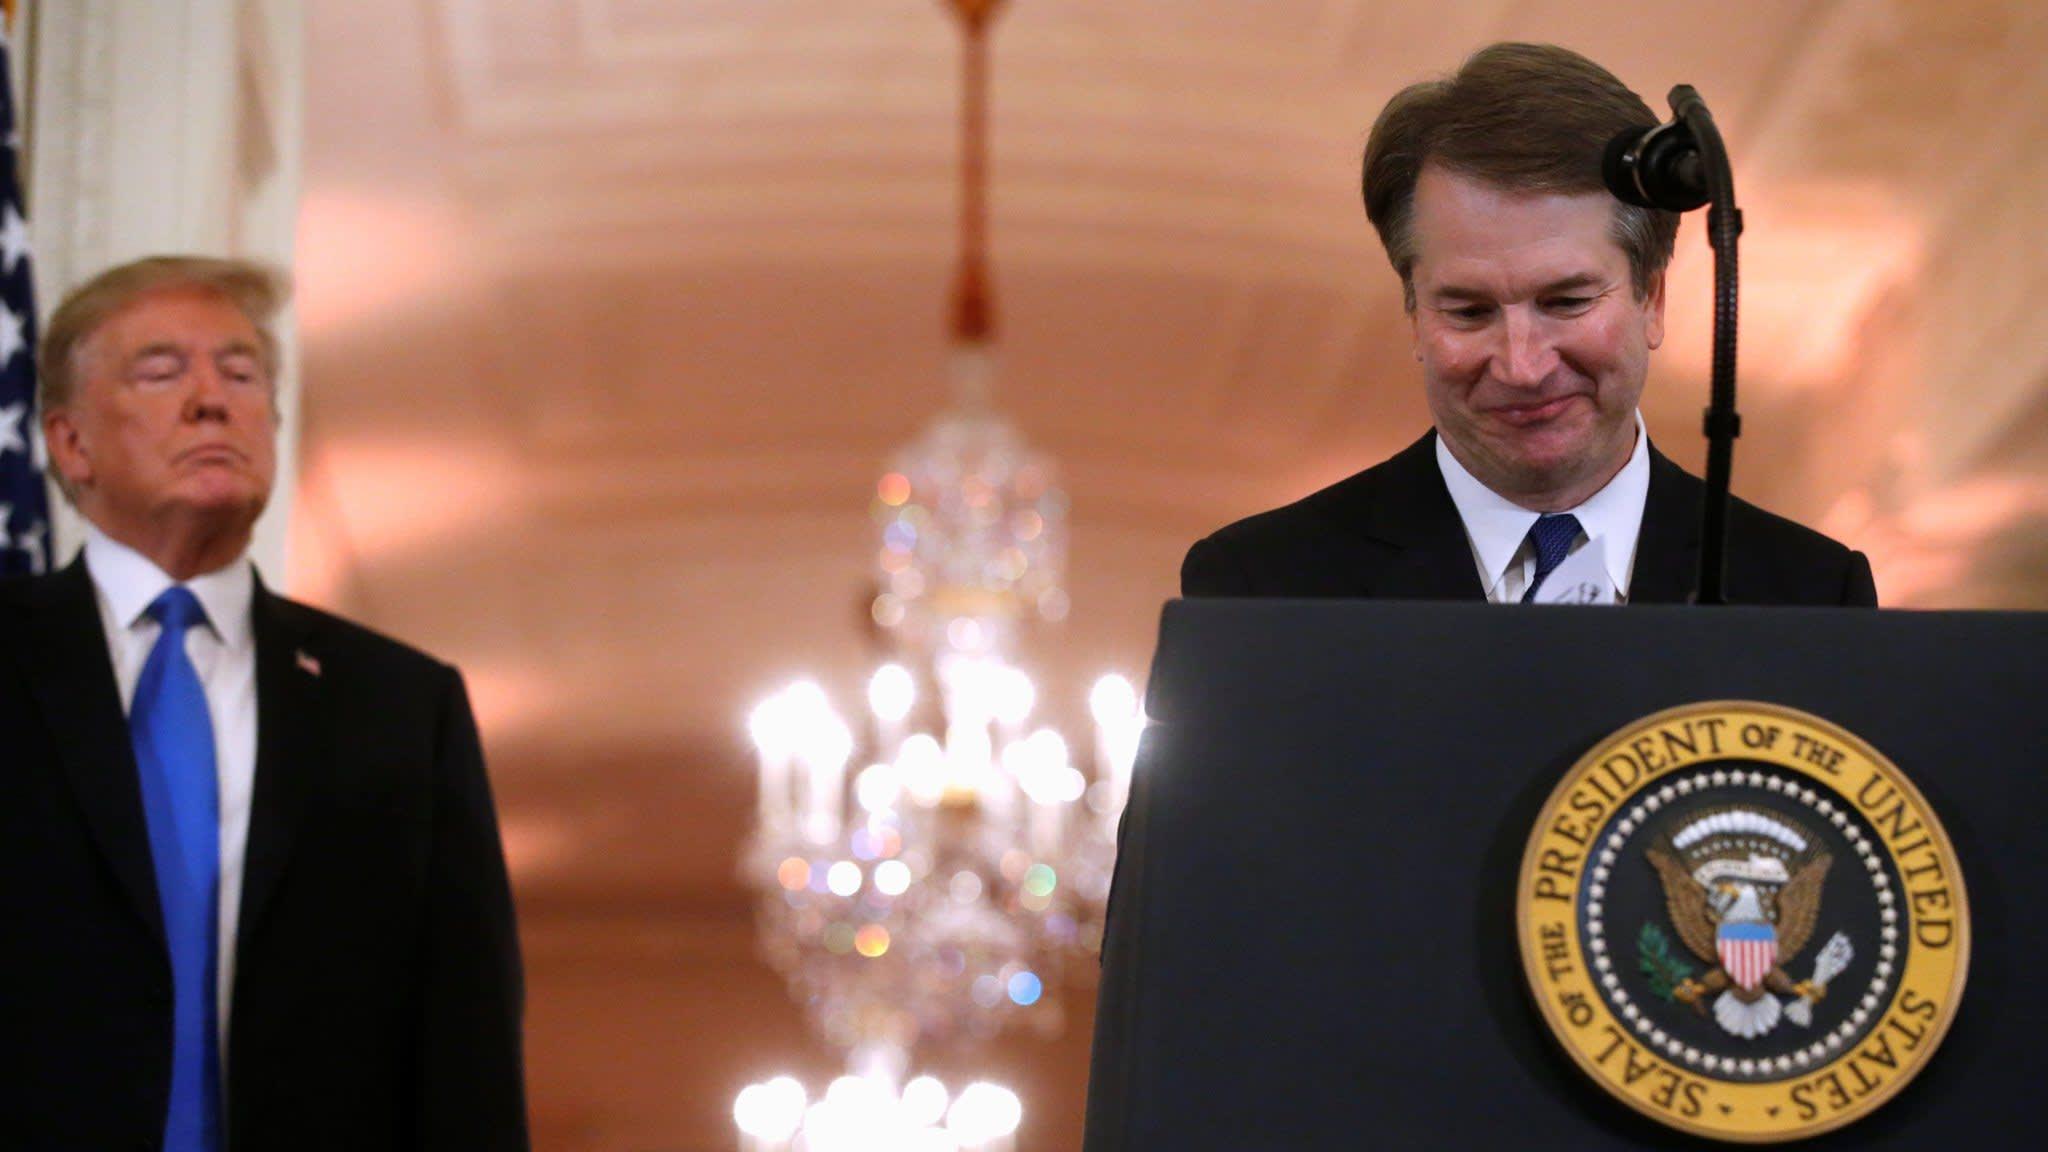 Donald Trump's court pick is a Republican stalwart